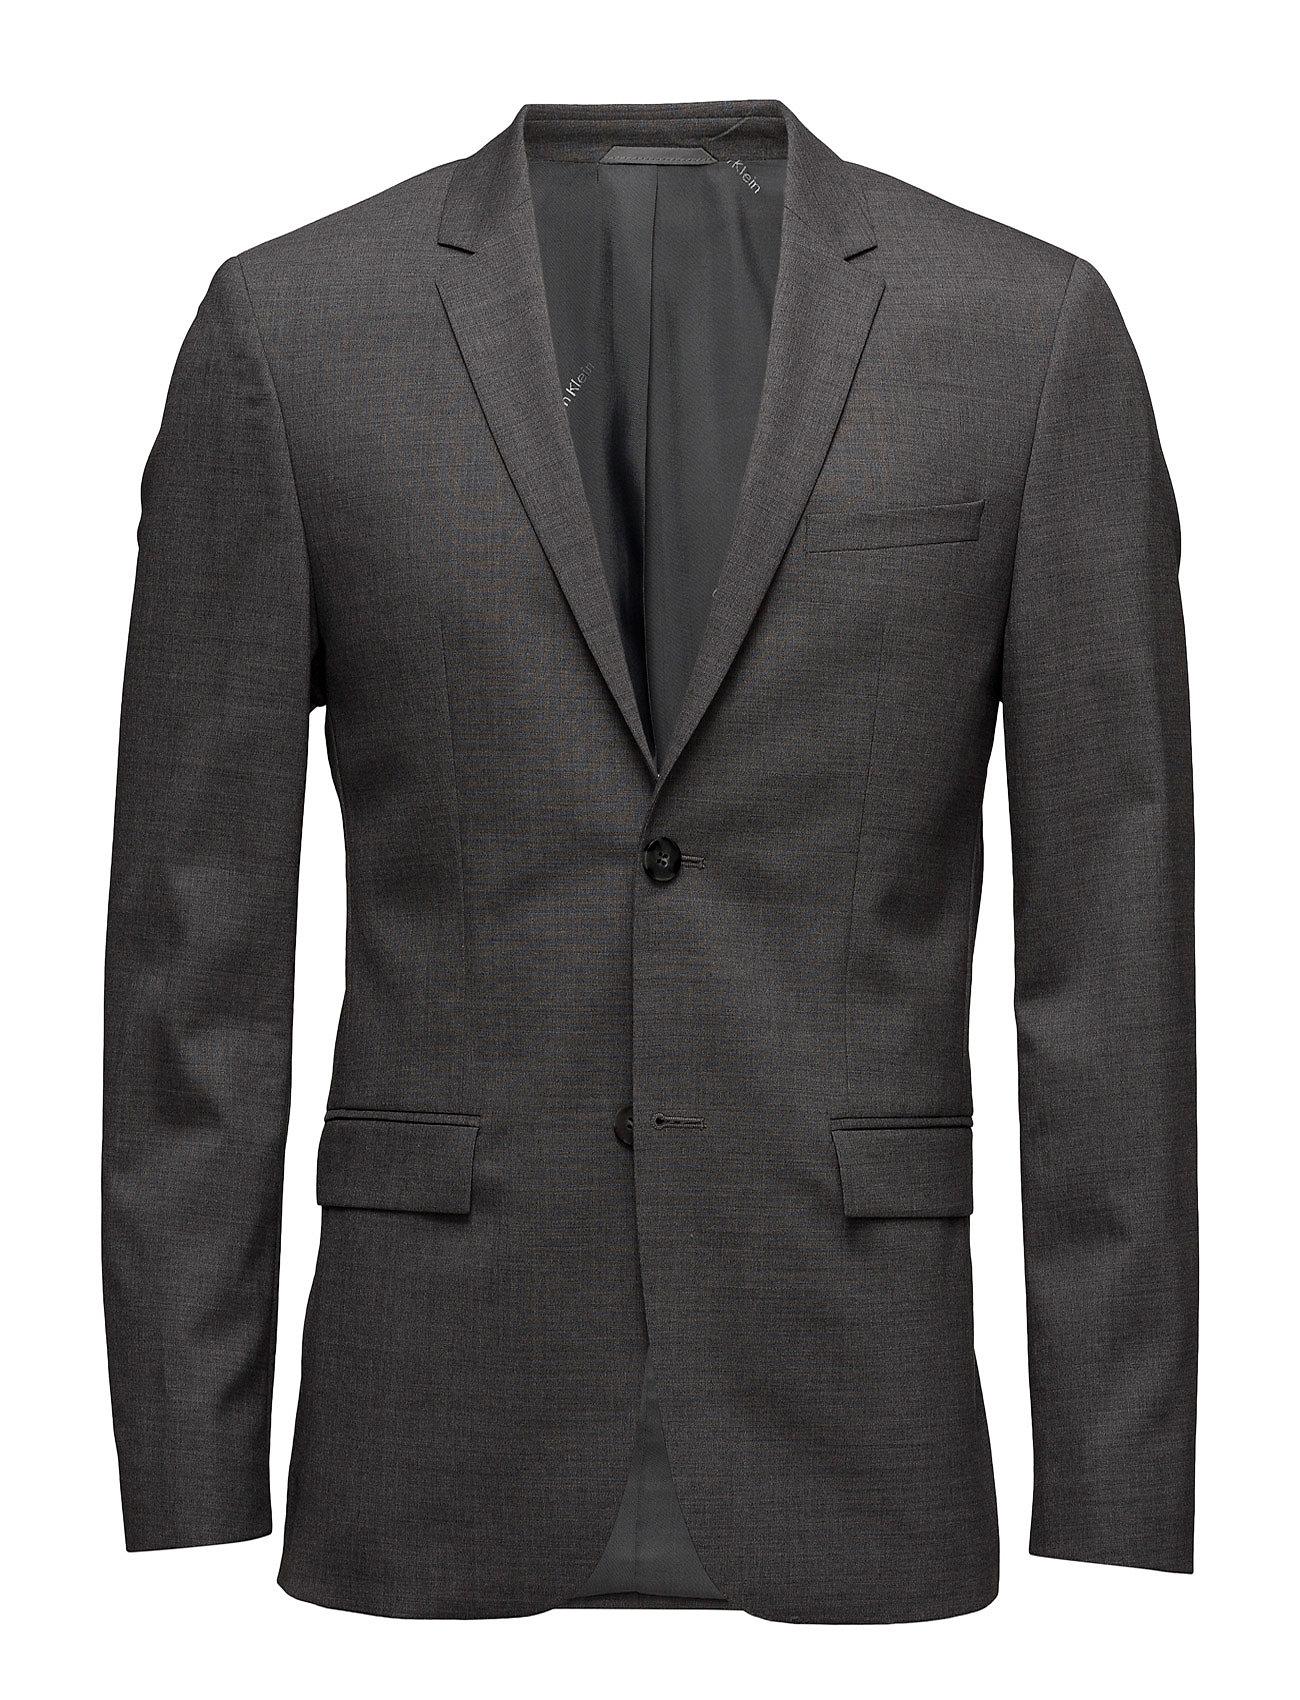 Tate-Bm Stretch Wool Calvin Klein Blazere til Herrer i Mellem grå